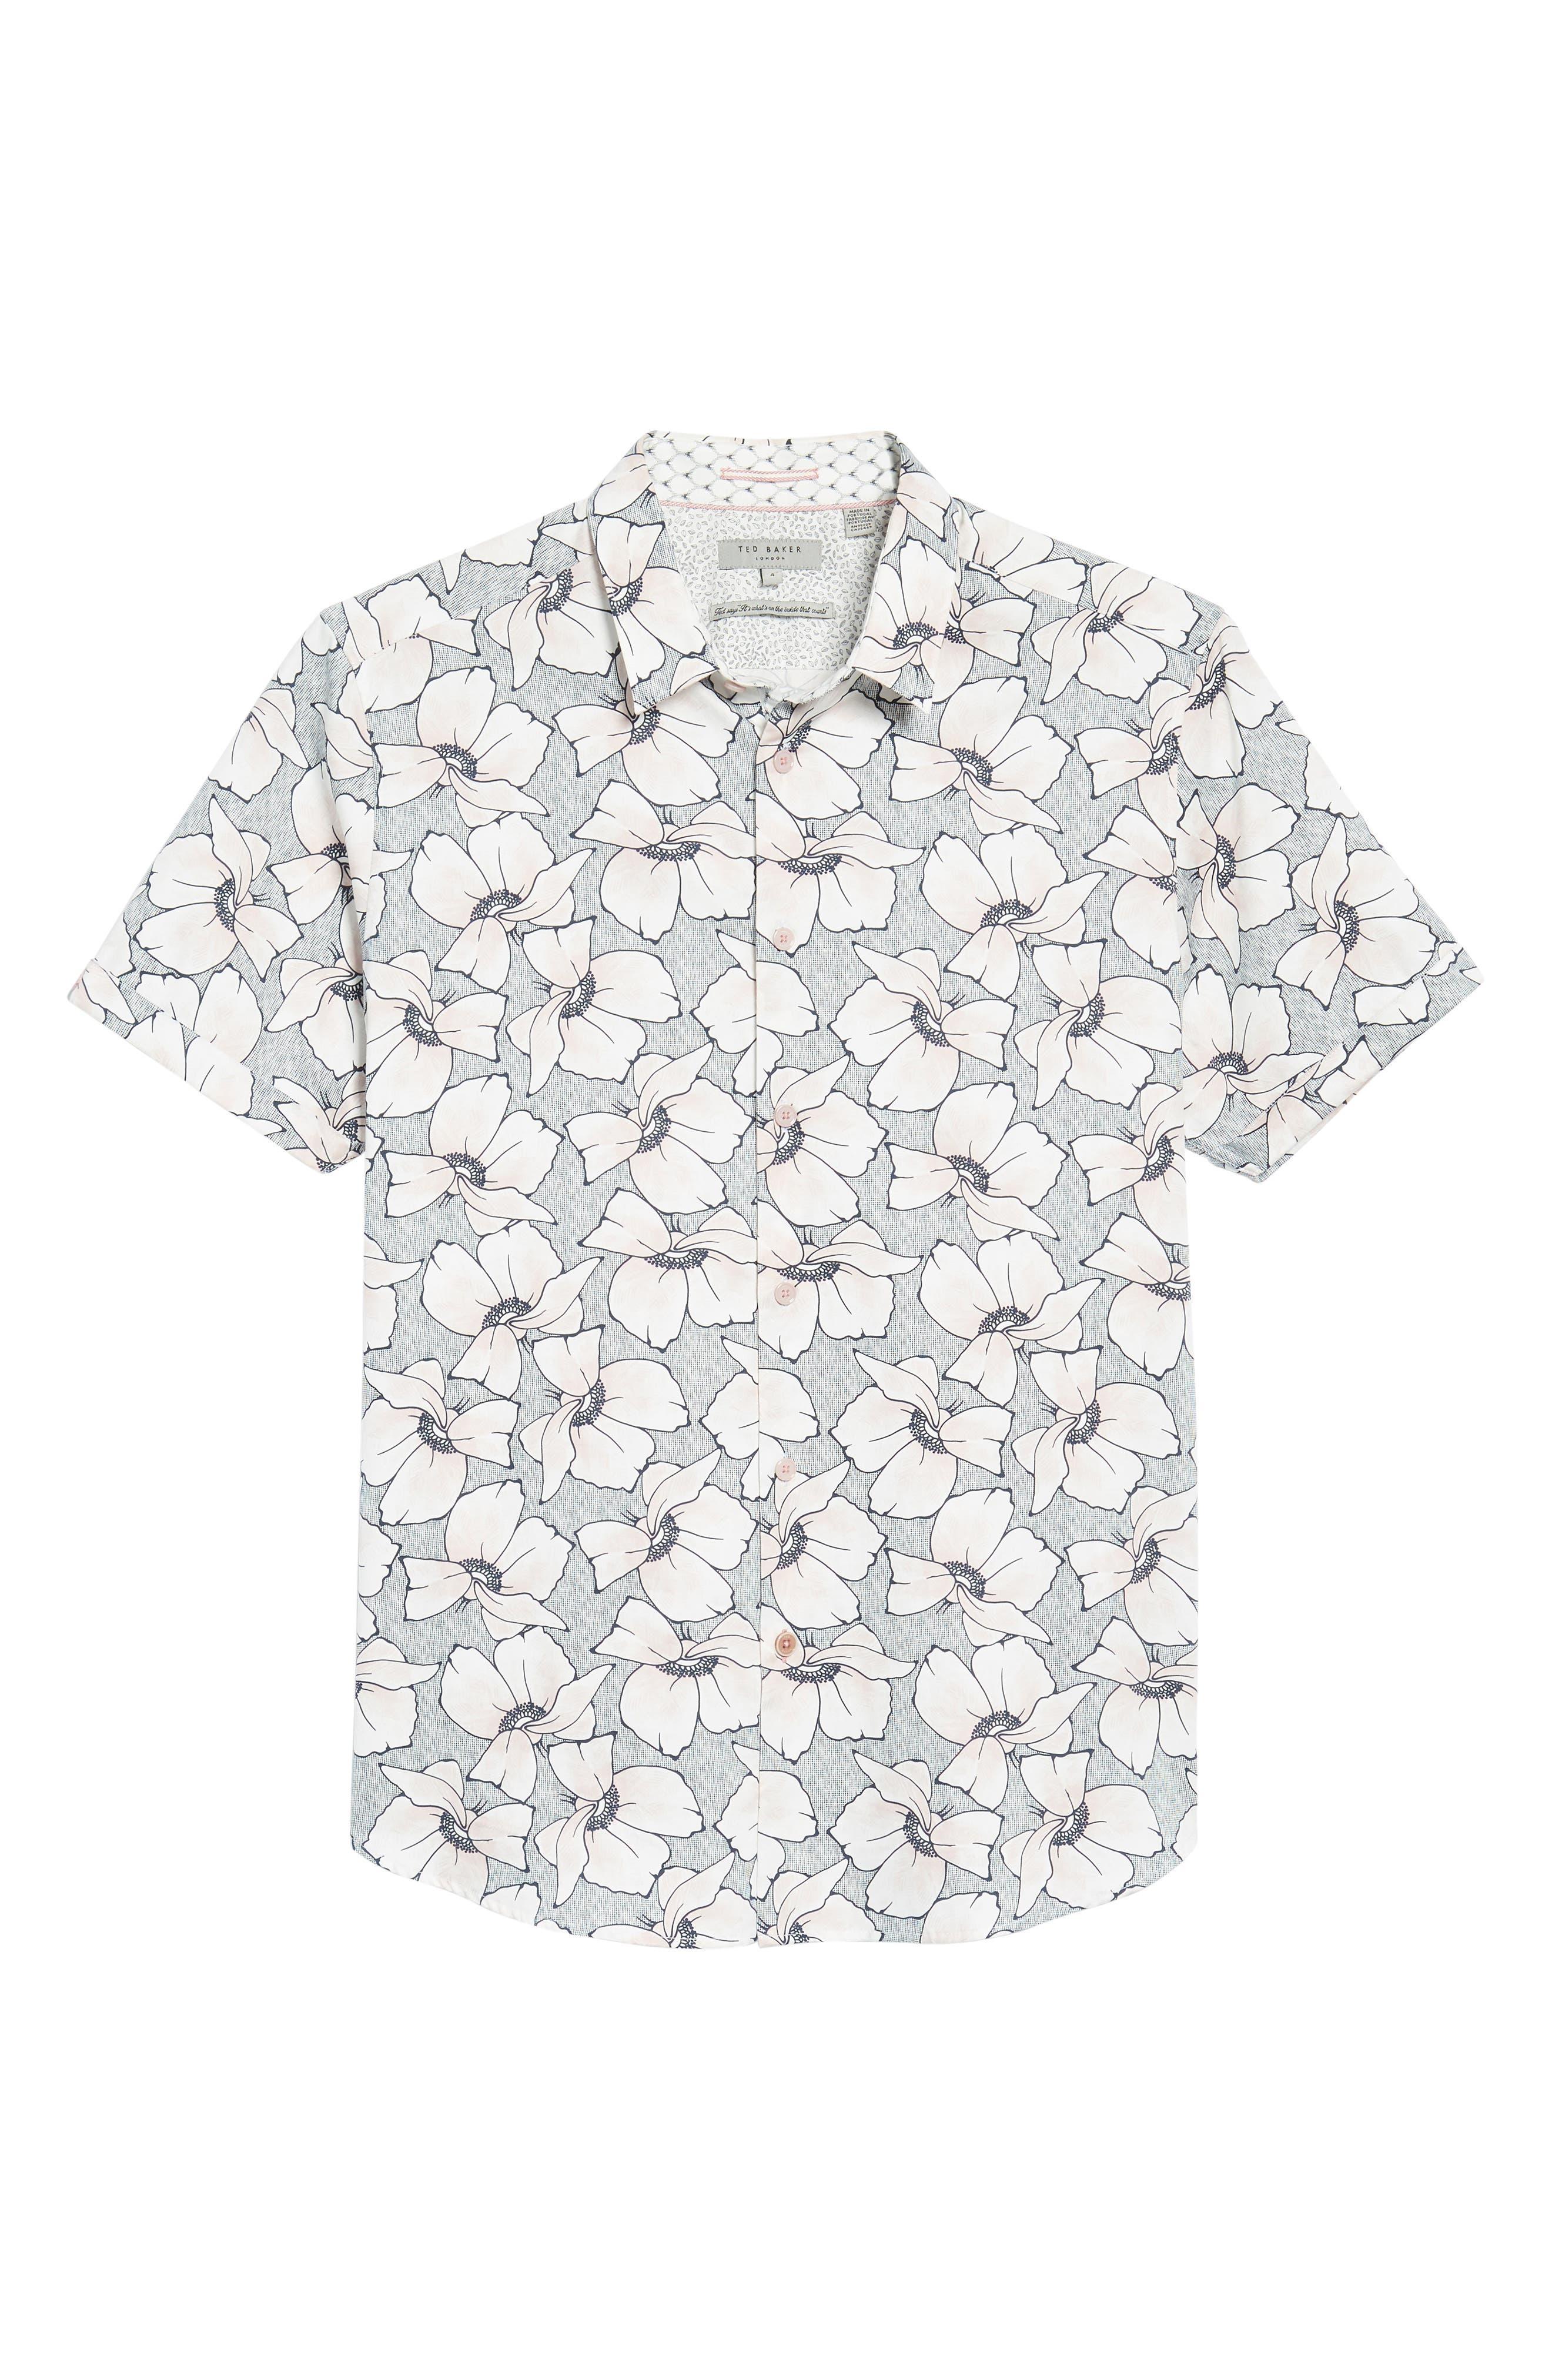 TED BAKER LONDON,                             Bigflo Floral Short Sleeve Sport Shirt,                             Alternate thumbnail 6, color,                             683